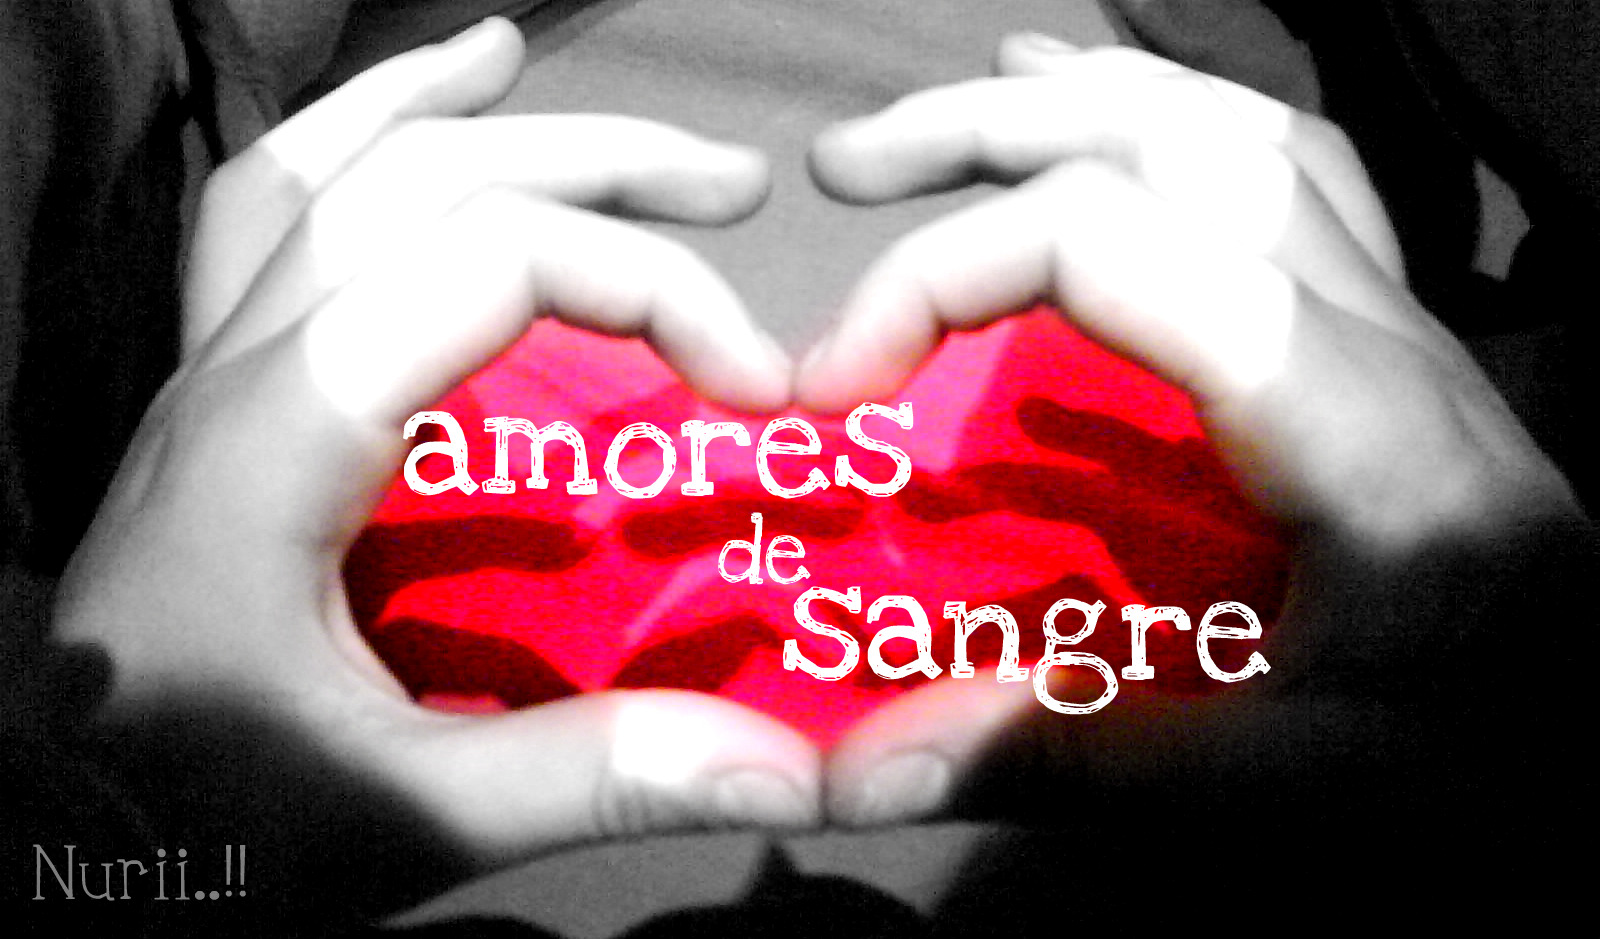 AMORES DE SANGRE